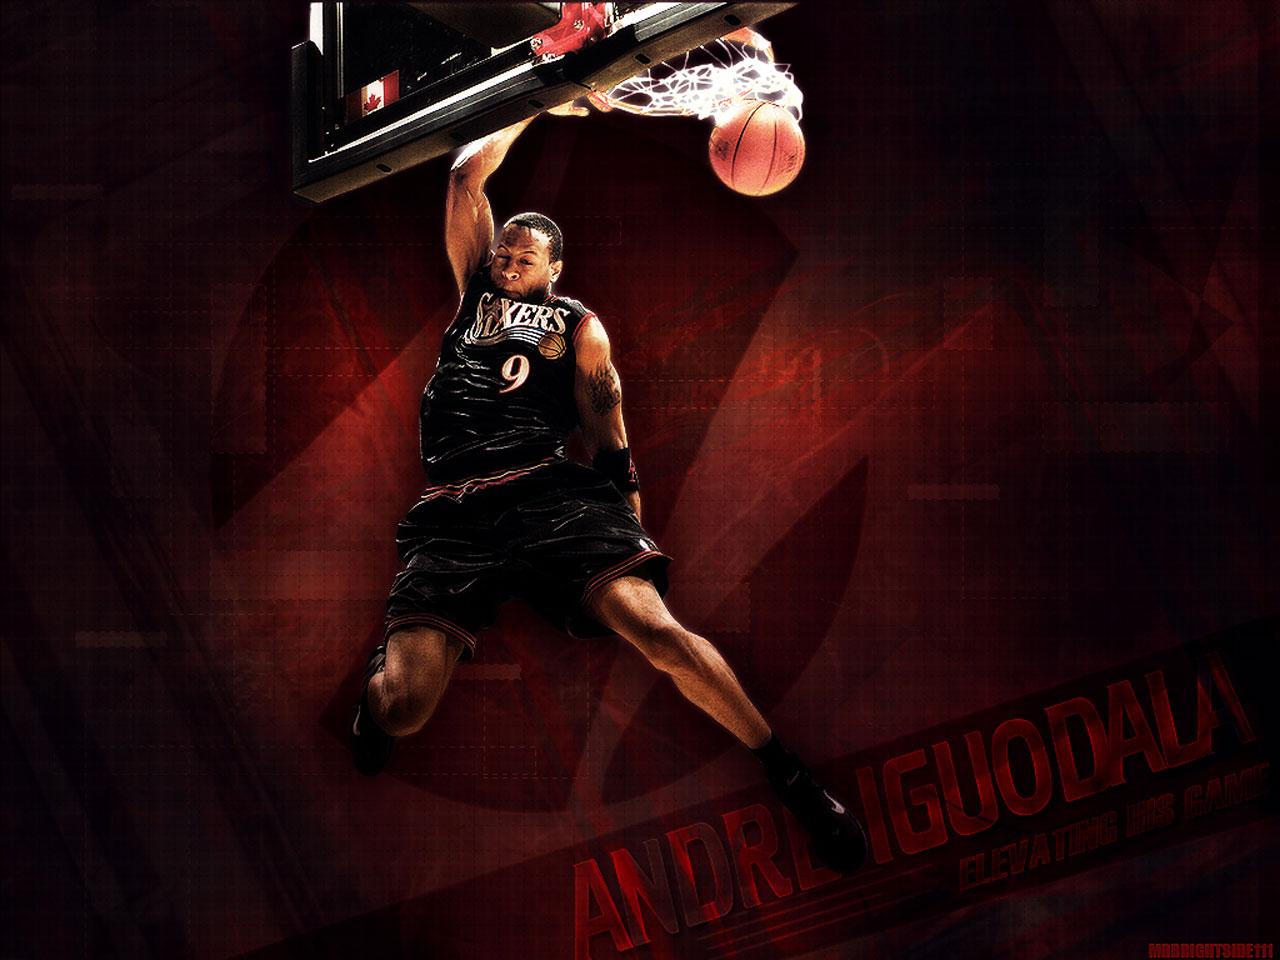 nba player pictures: Andre Iguodala Philadelphia 76ers